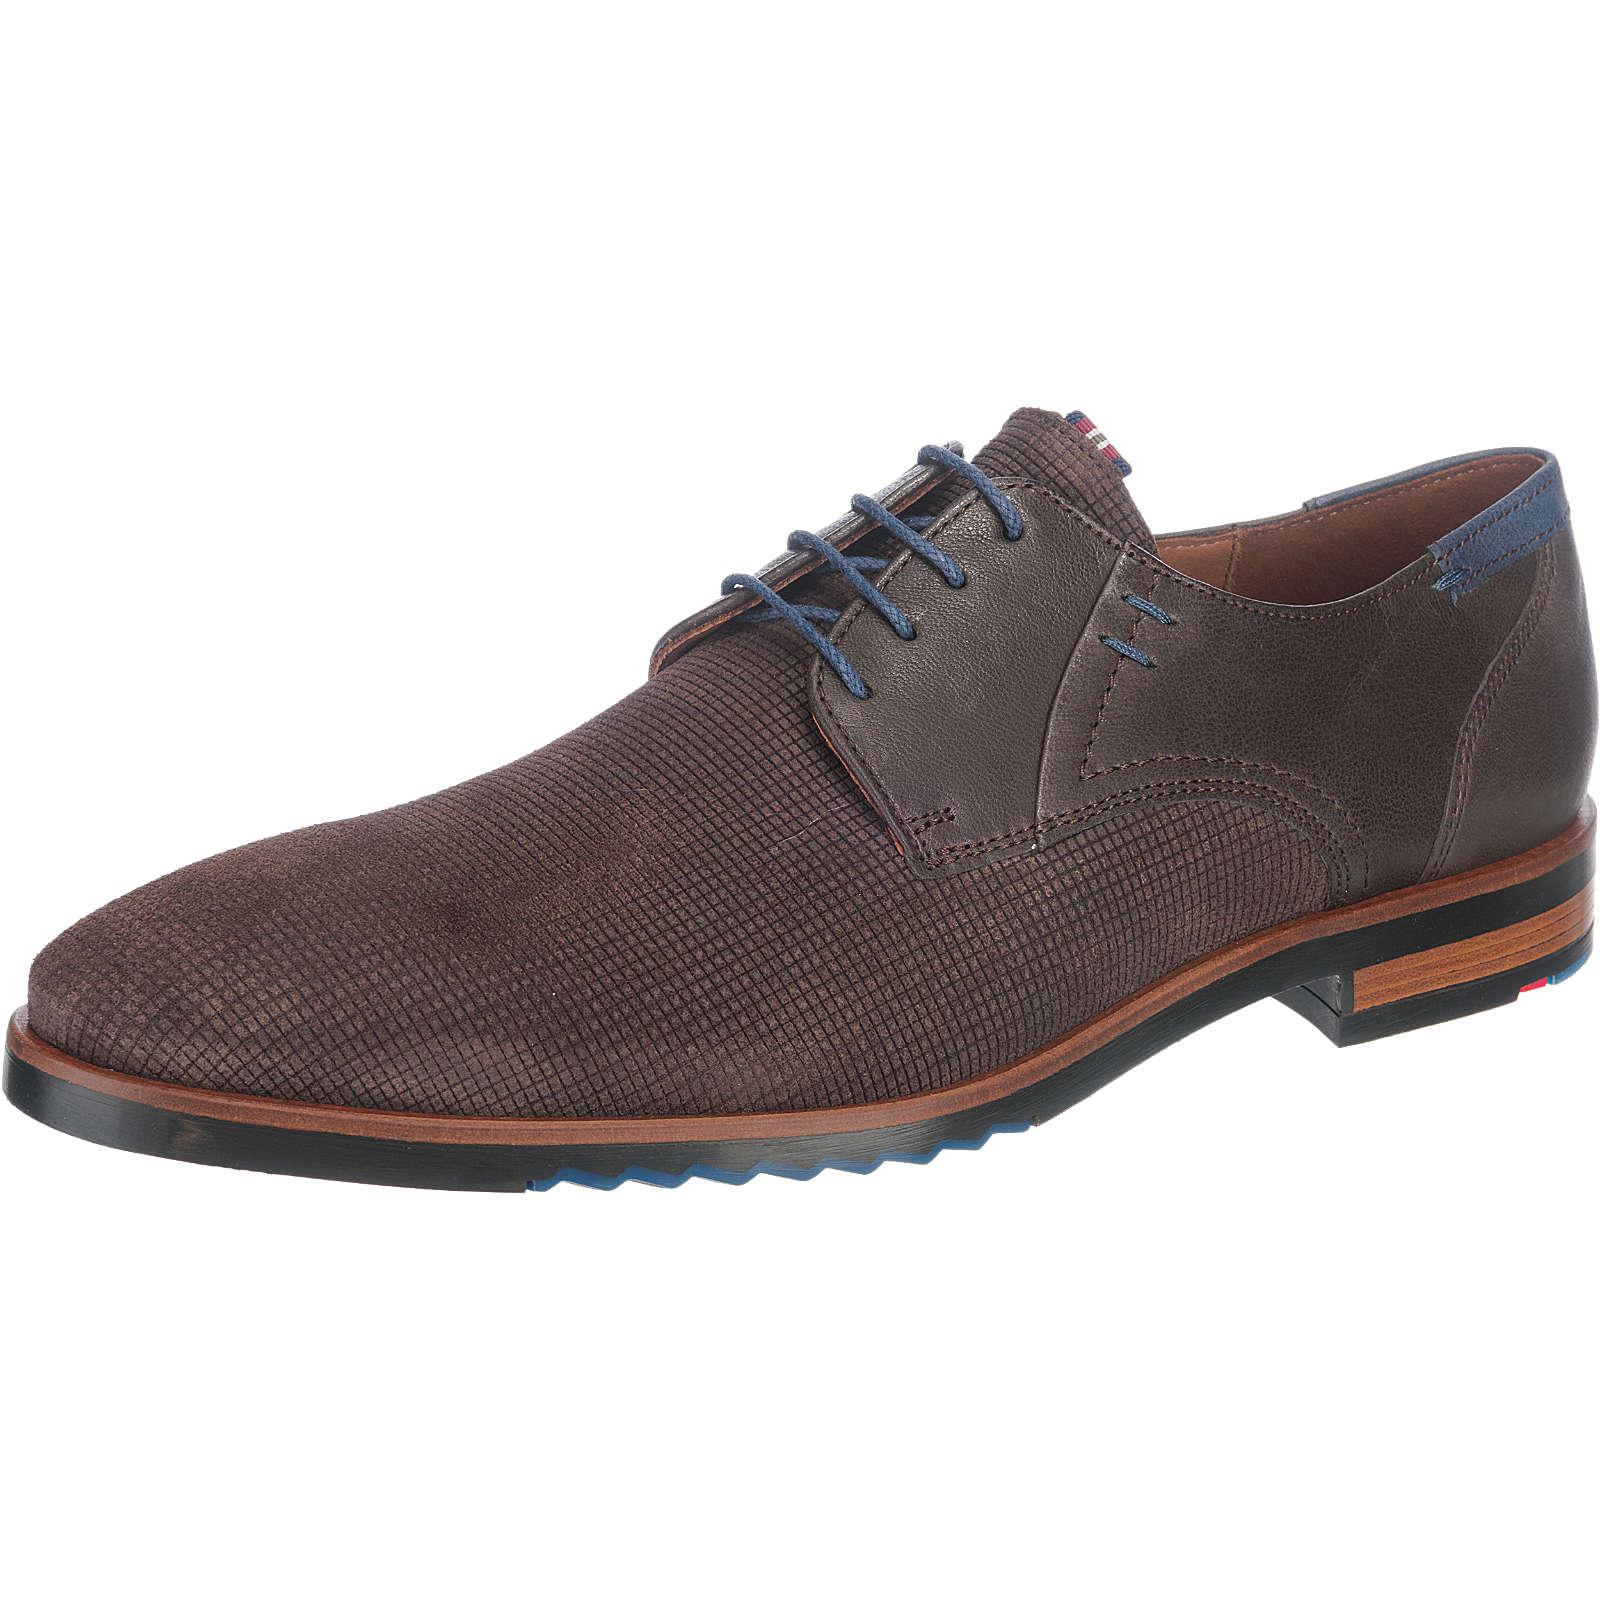 LLOYD Diaz Business Schuhe braun Herren Gr. 44,5